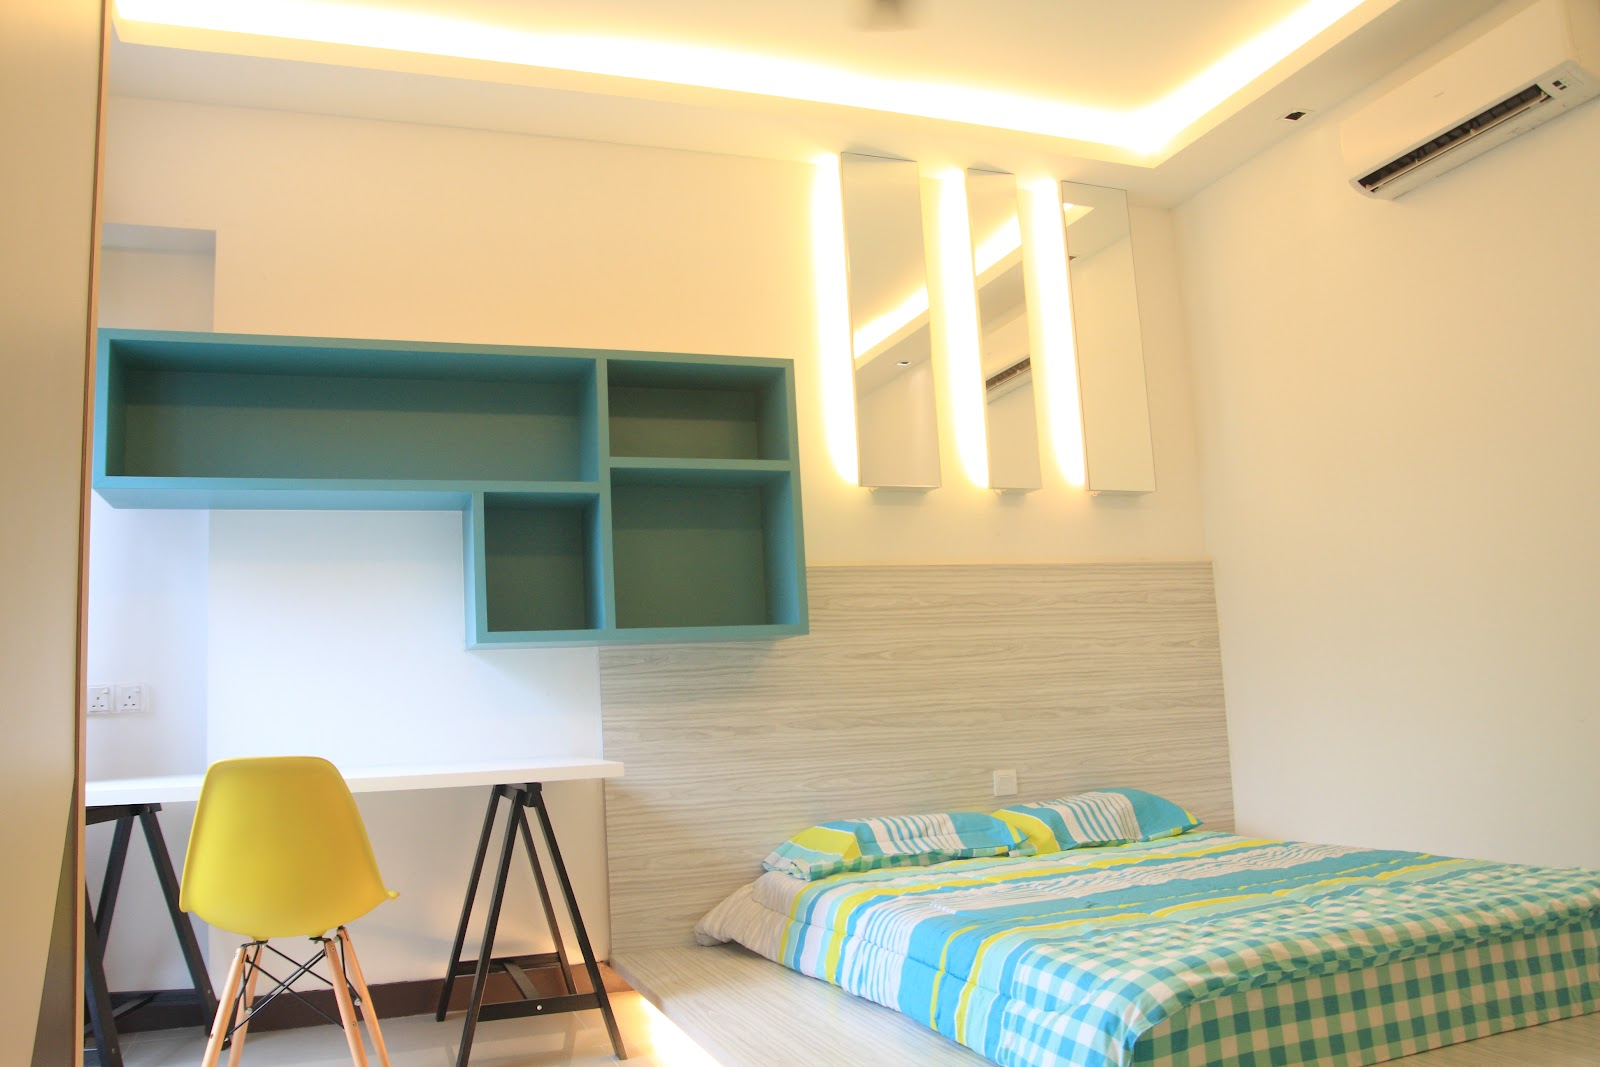 Accommodation Monash University Malaysia